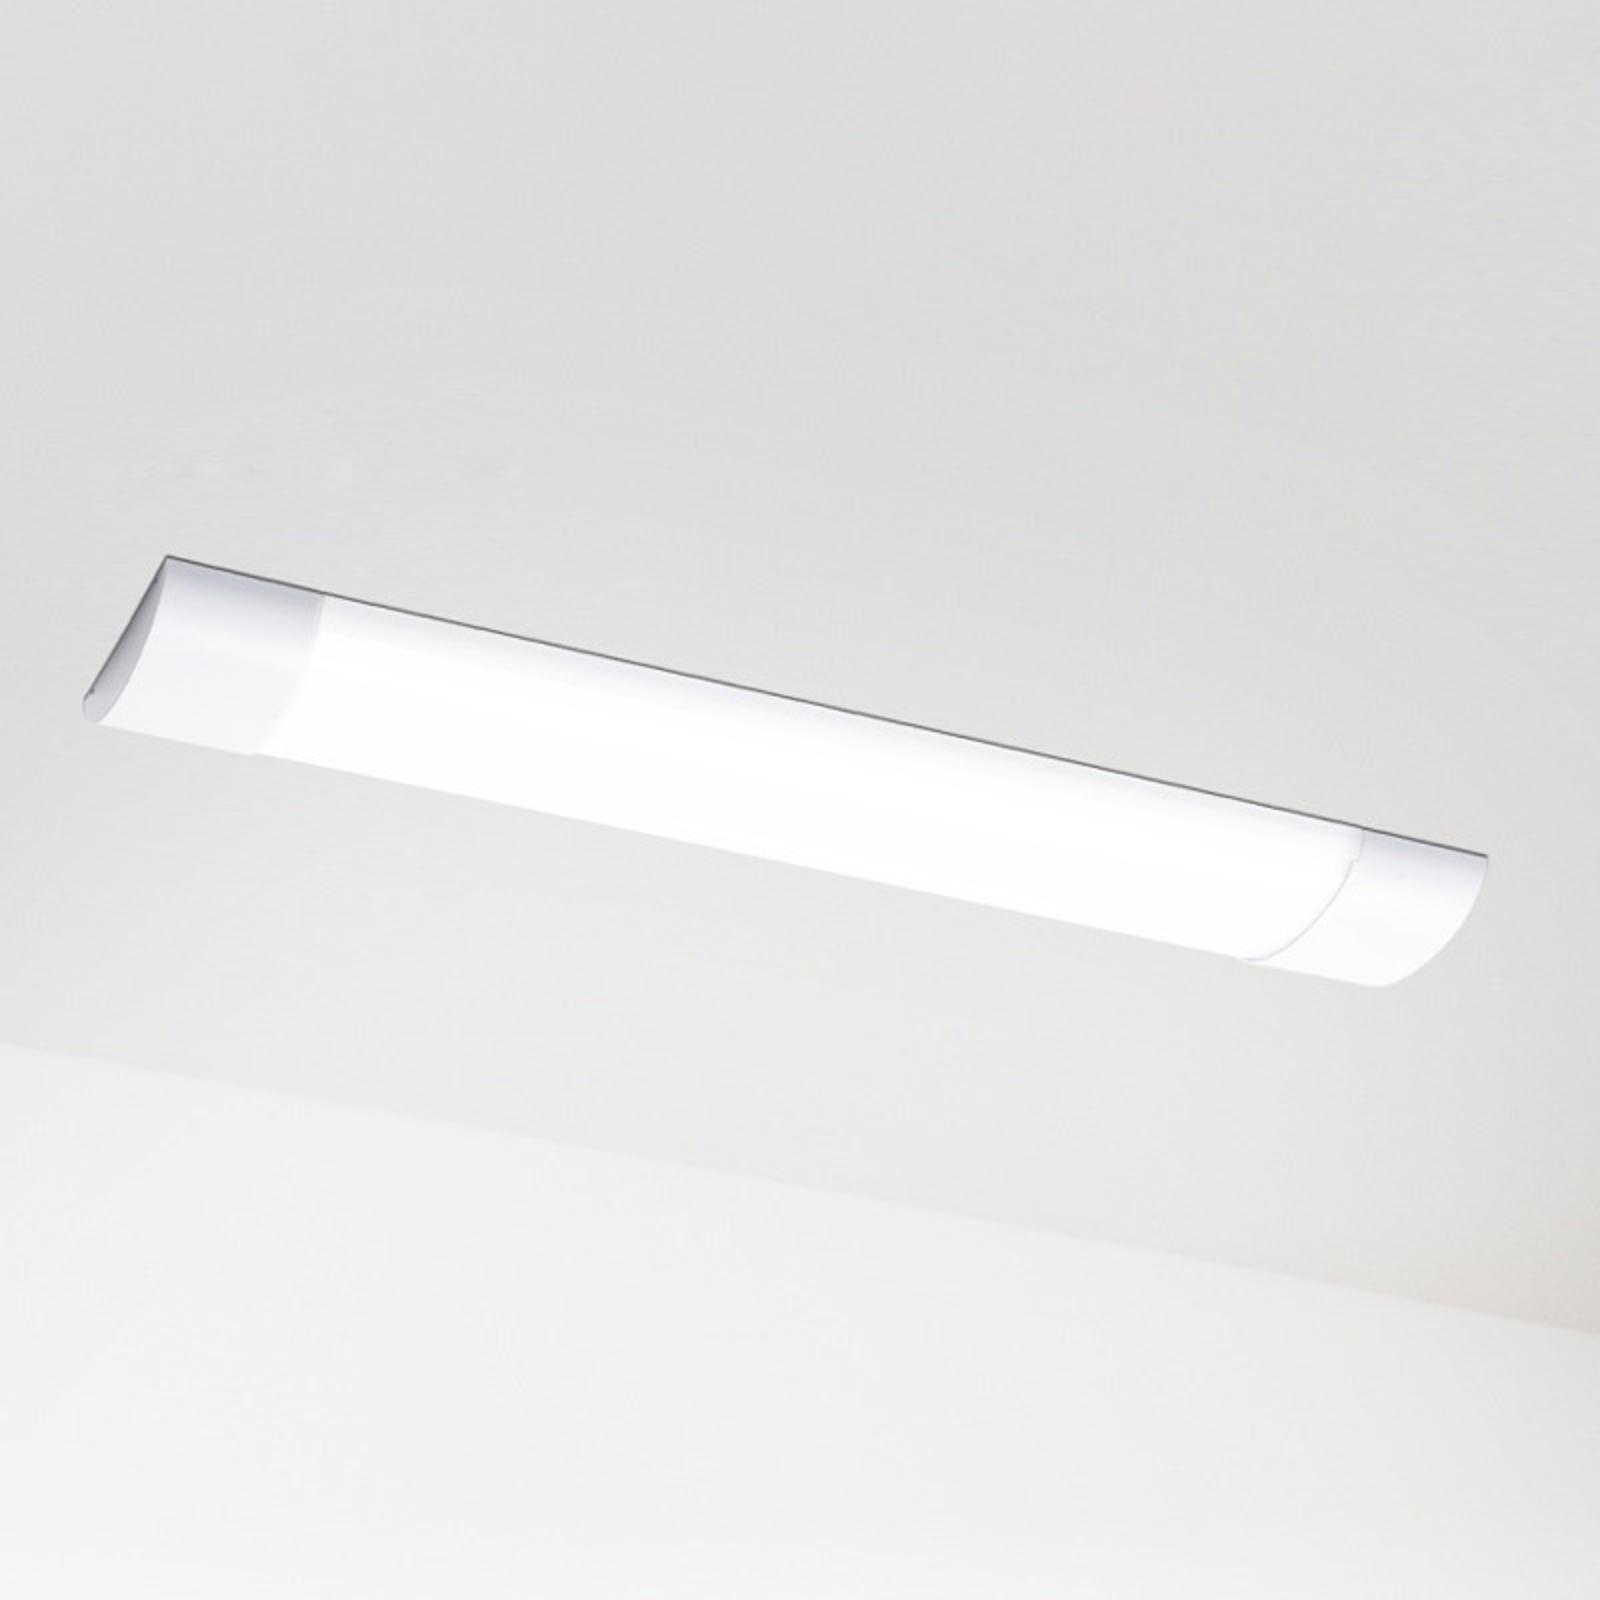 Scala Dim 120 LED-taklampe av aluminium